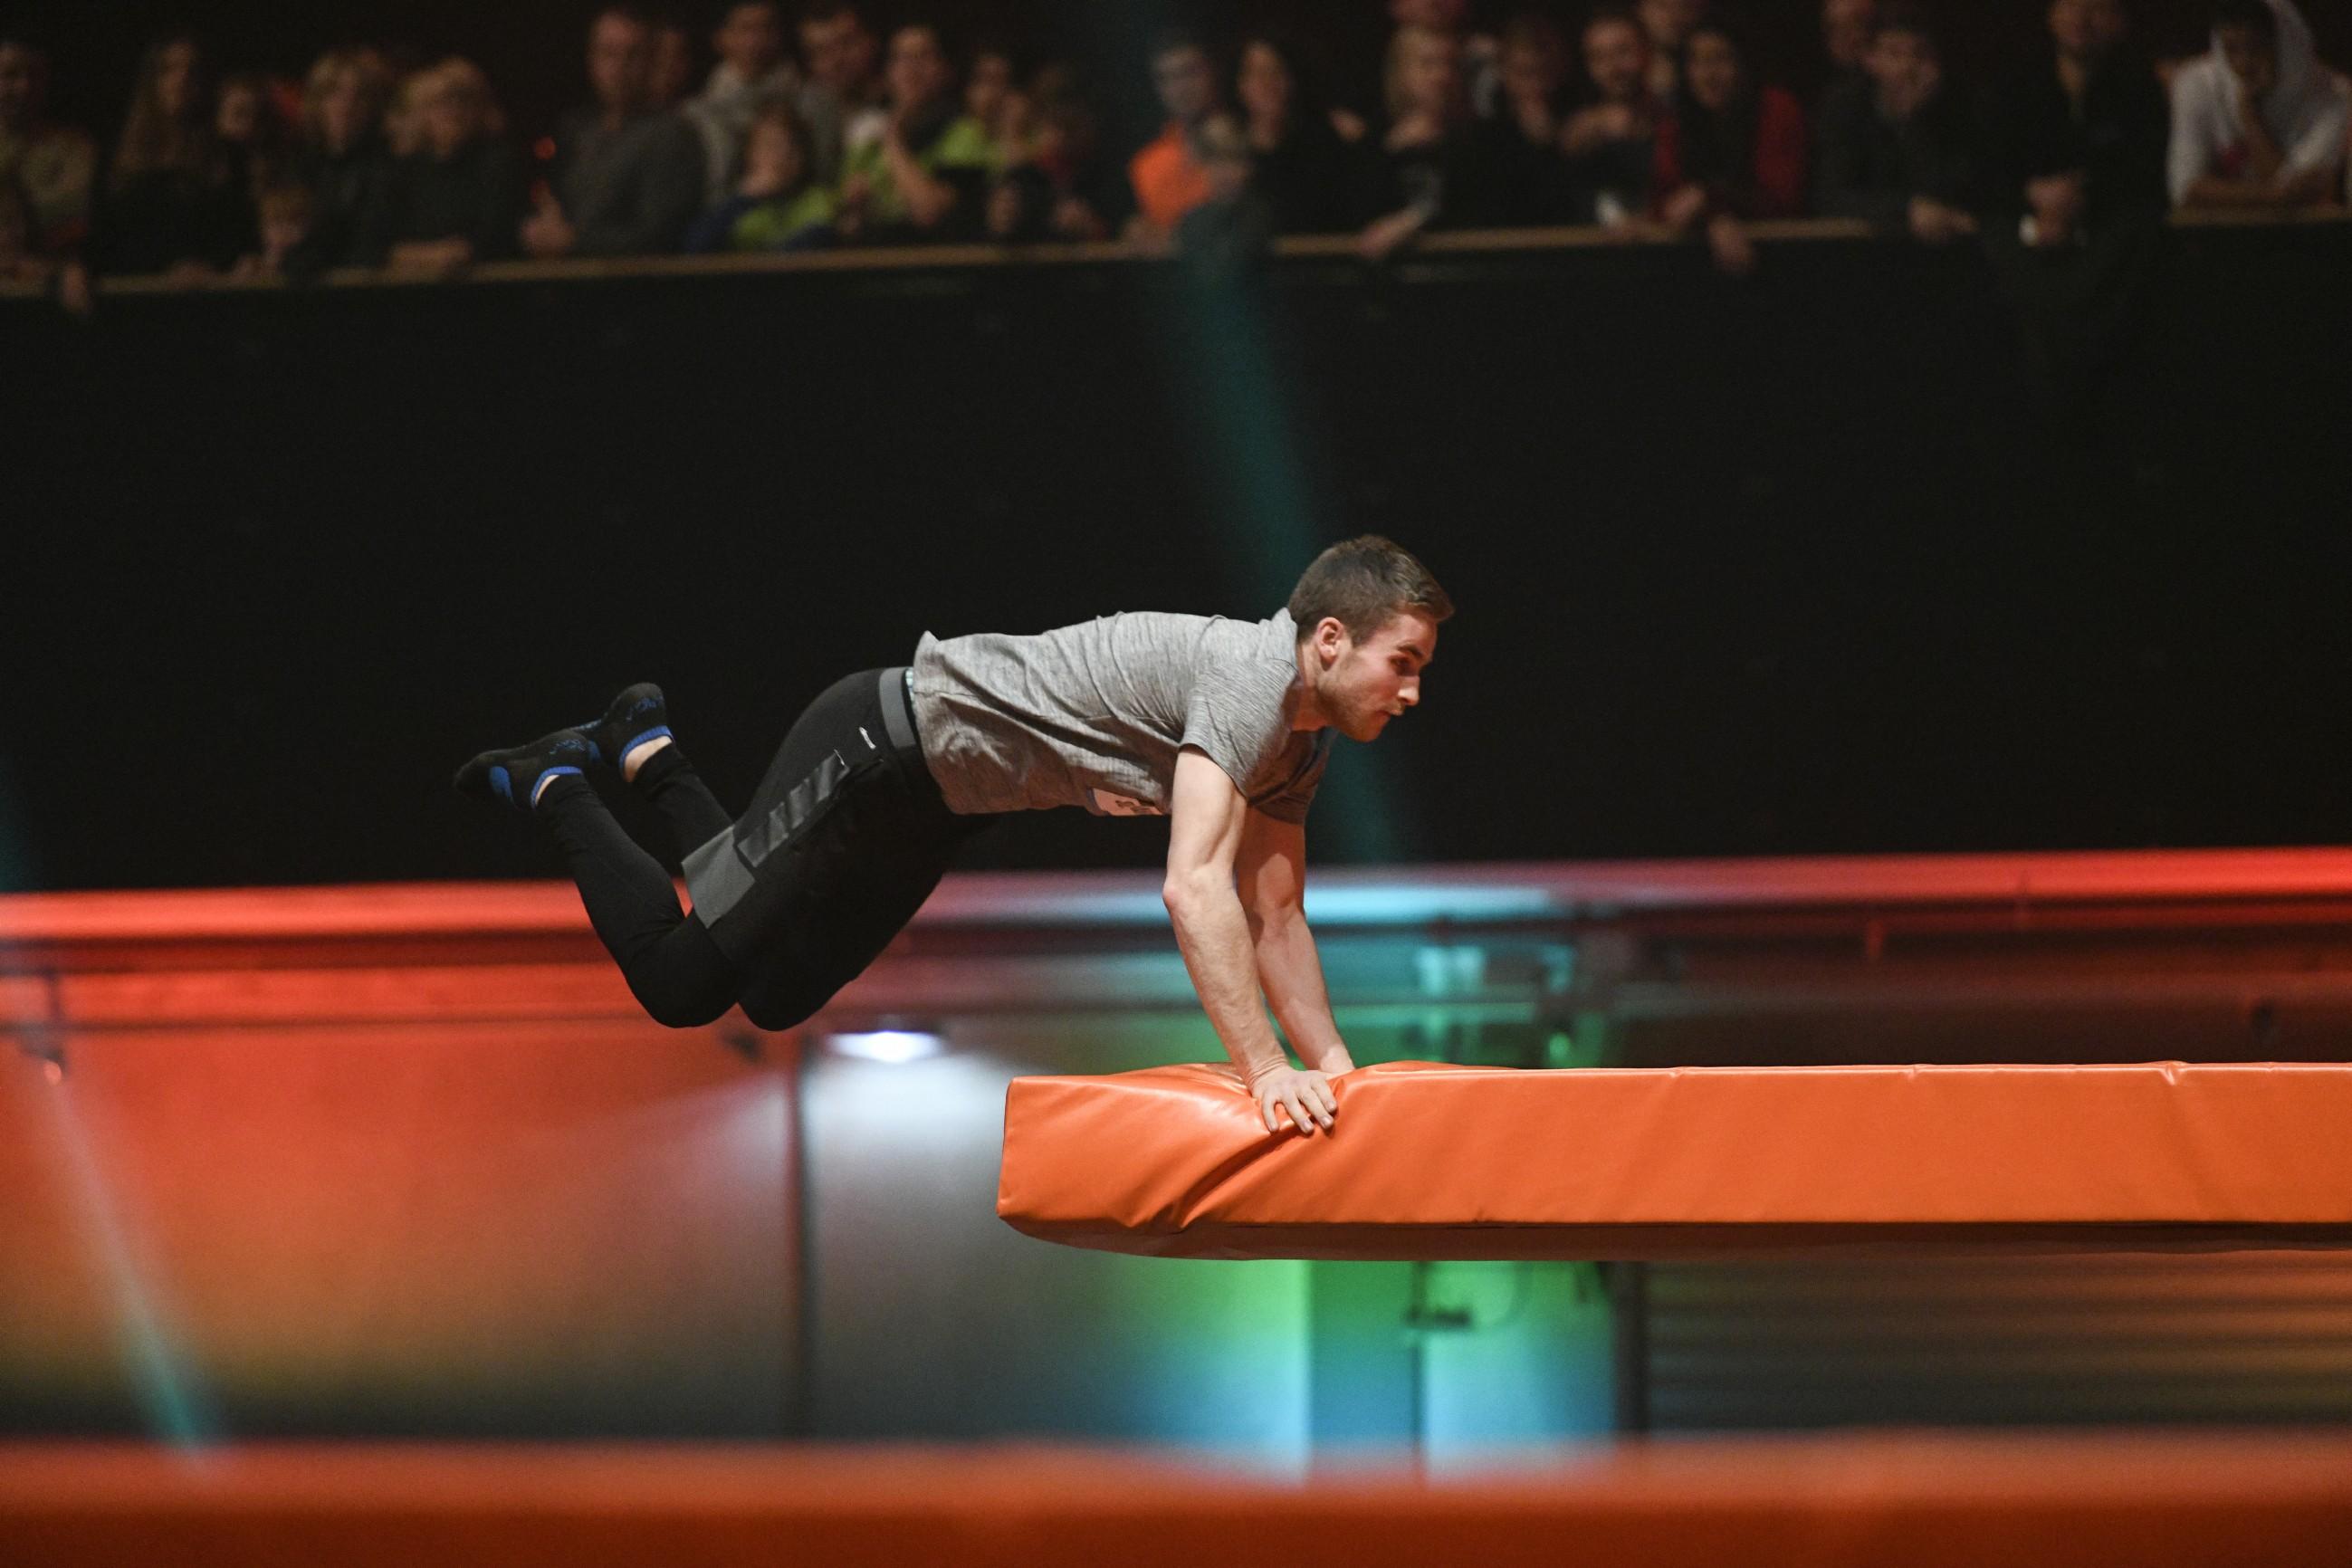 Big Bounce Finale - Sebastian Klinger